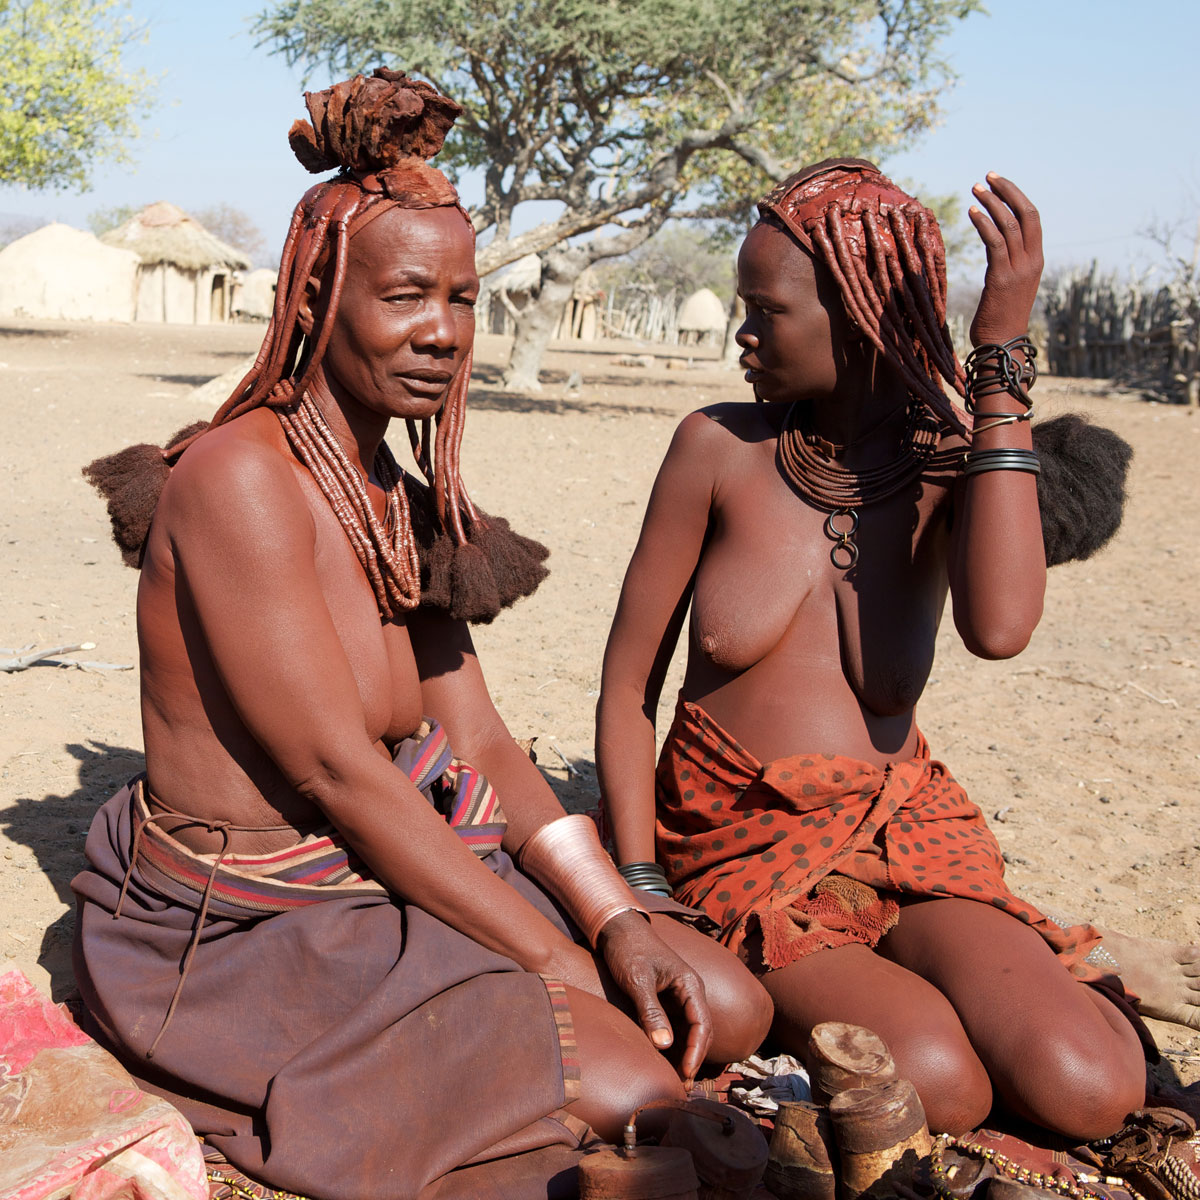 namibia_052_SP